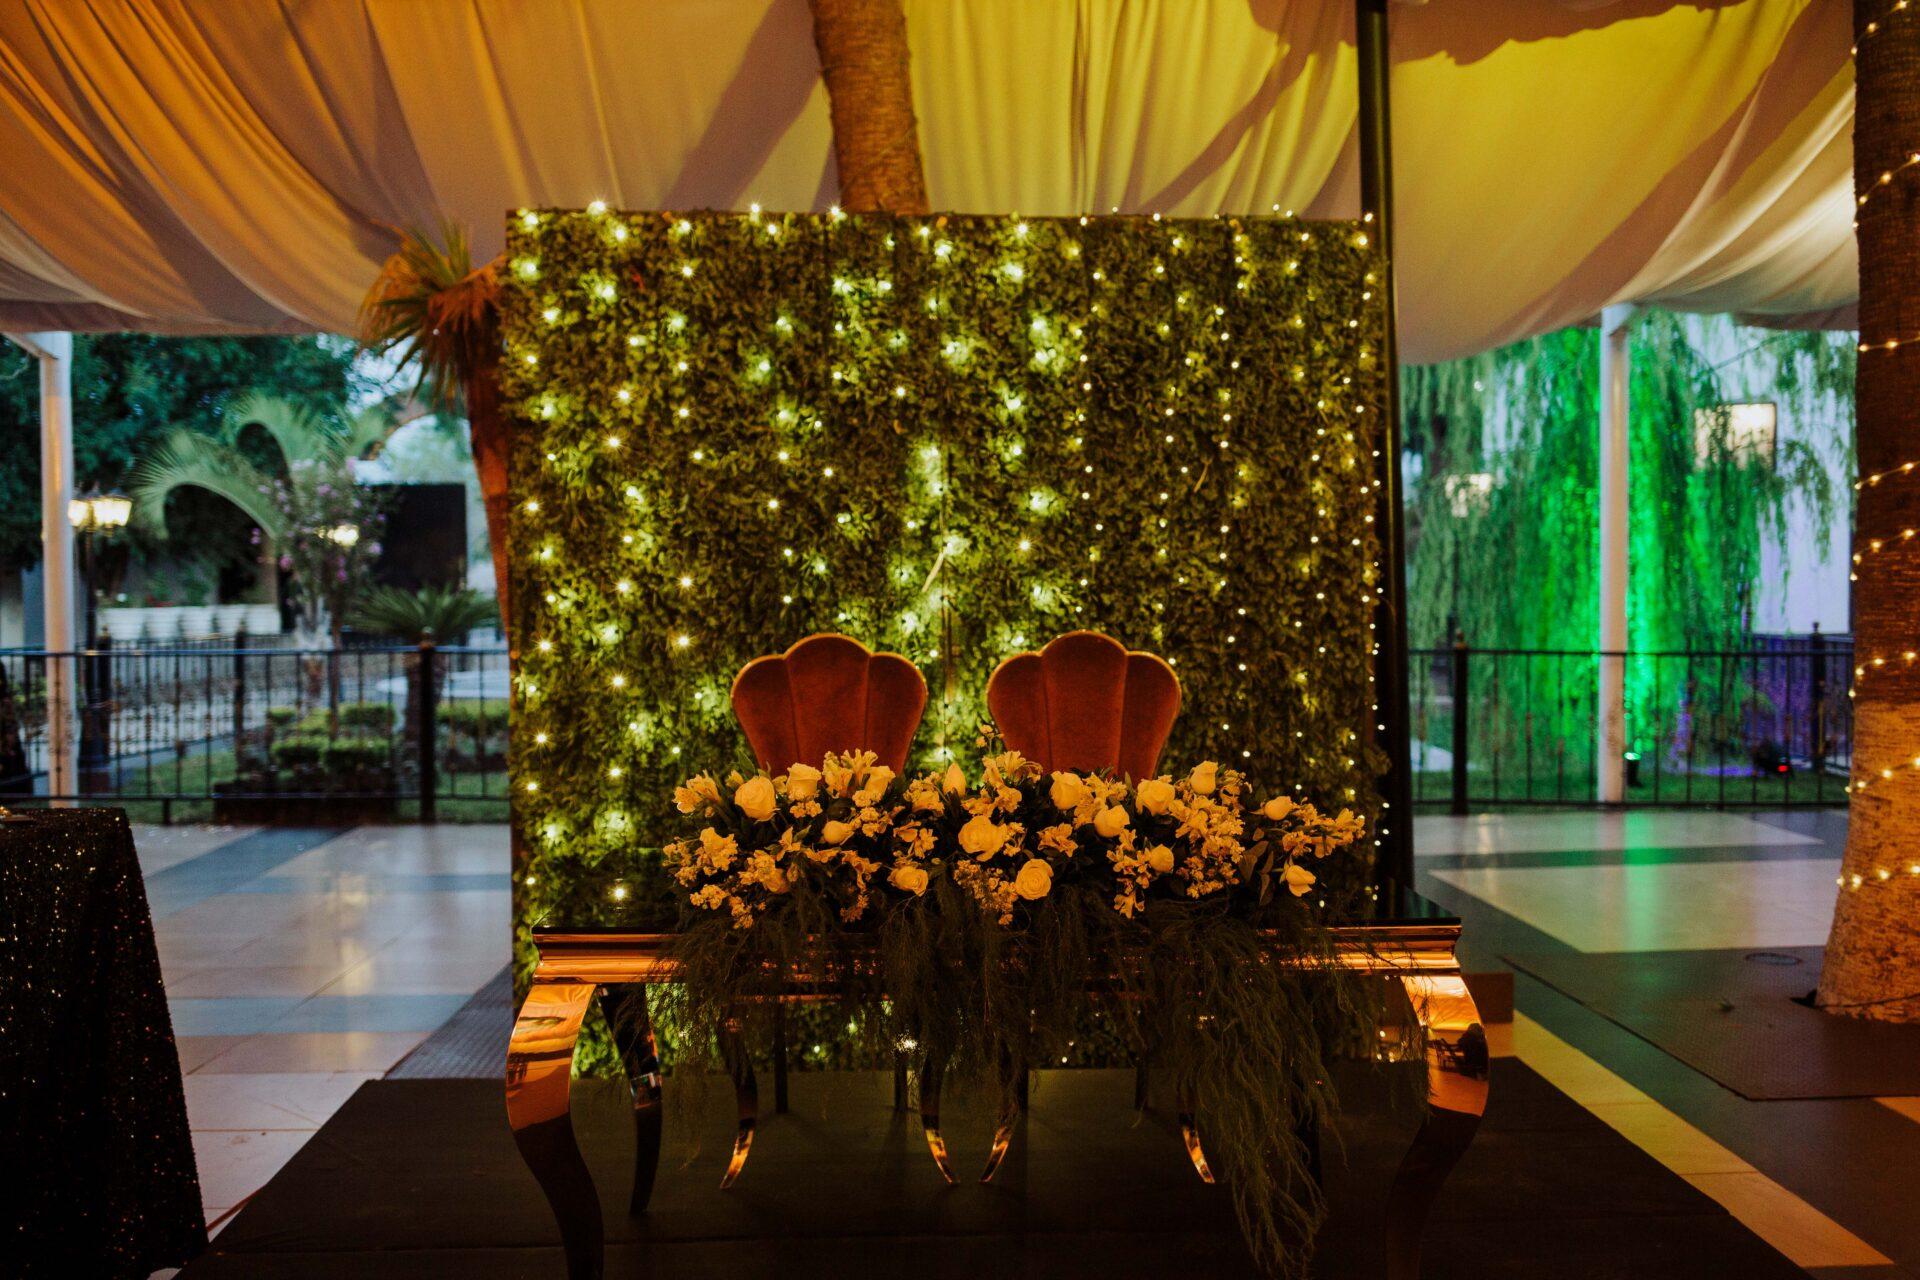 javier_noriega_fotografo_bodas_torreon_coahuila_zacatecas_wedding_photographer47a